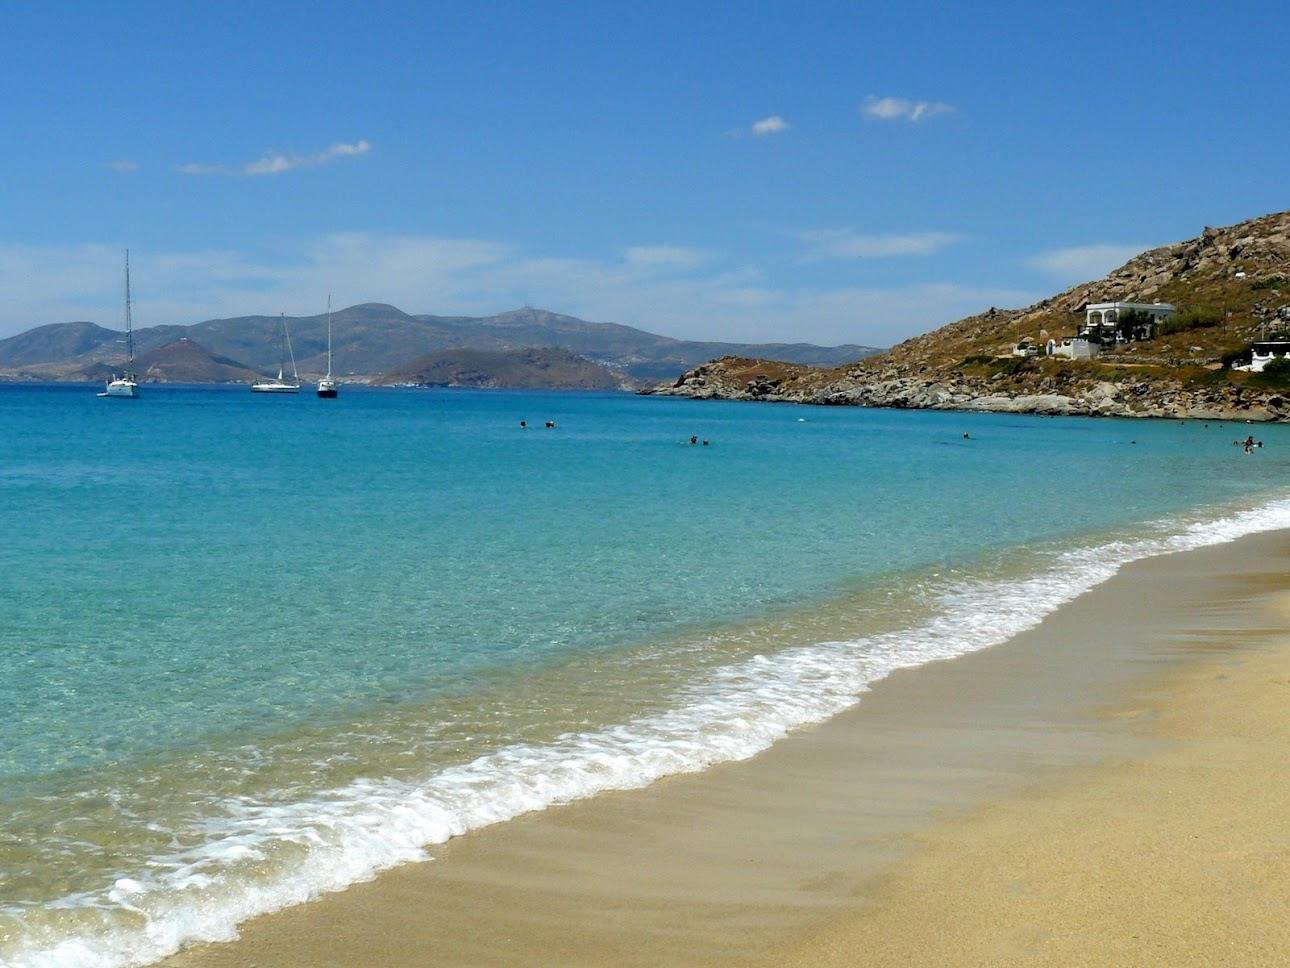 Agios Prokopios